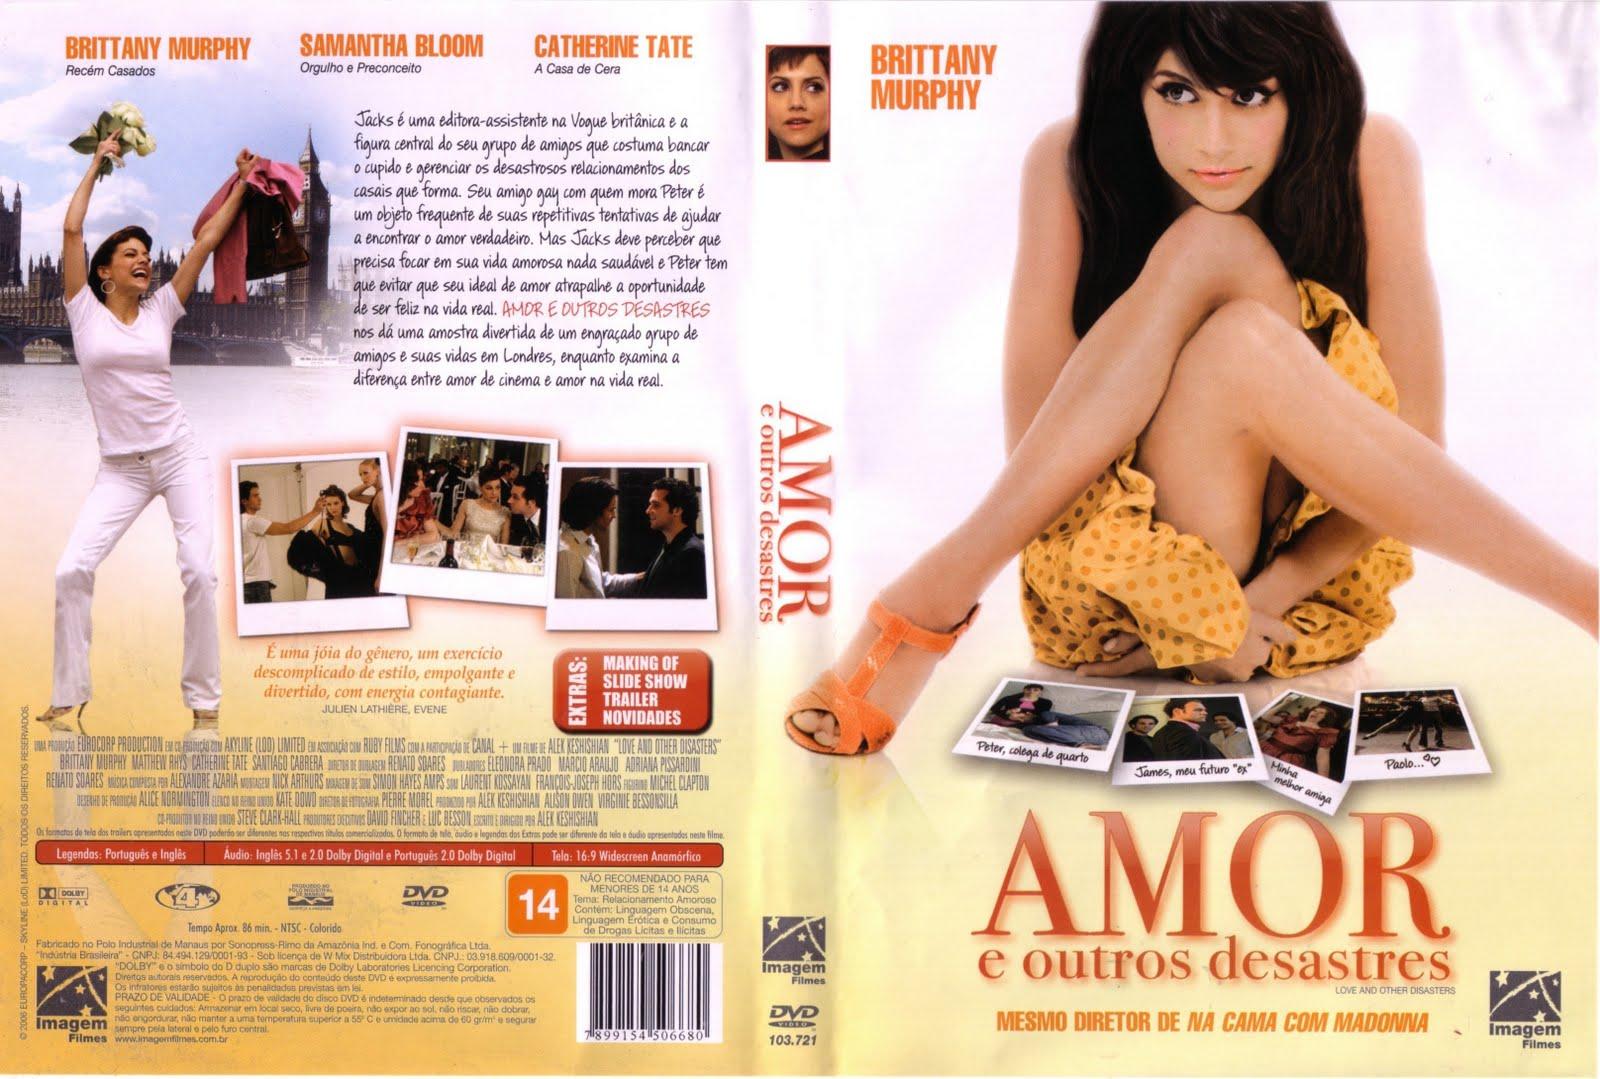 http://1.bp.blogspot.com/-jN0CIee-nXs/T6HBFq9ZR6I/AAAAAAAABL8/7c6NnuvpvUM/s1600/amoreoutrosdesastres-euzinha_nit21.jpg